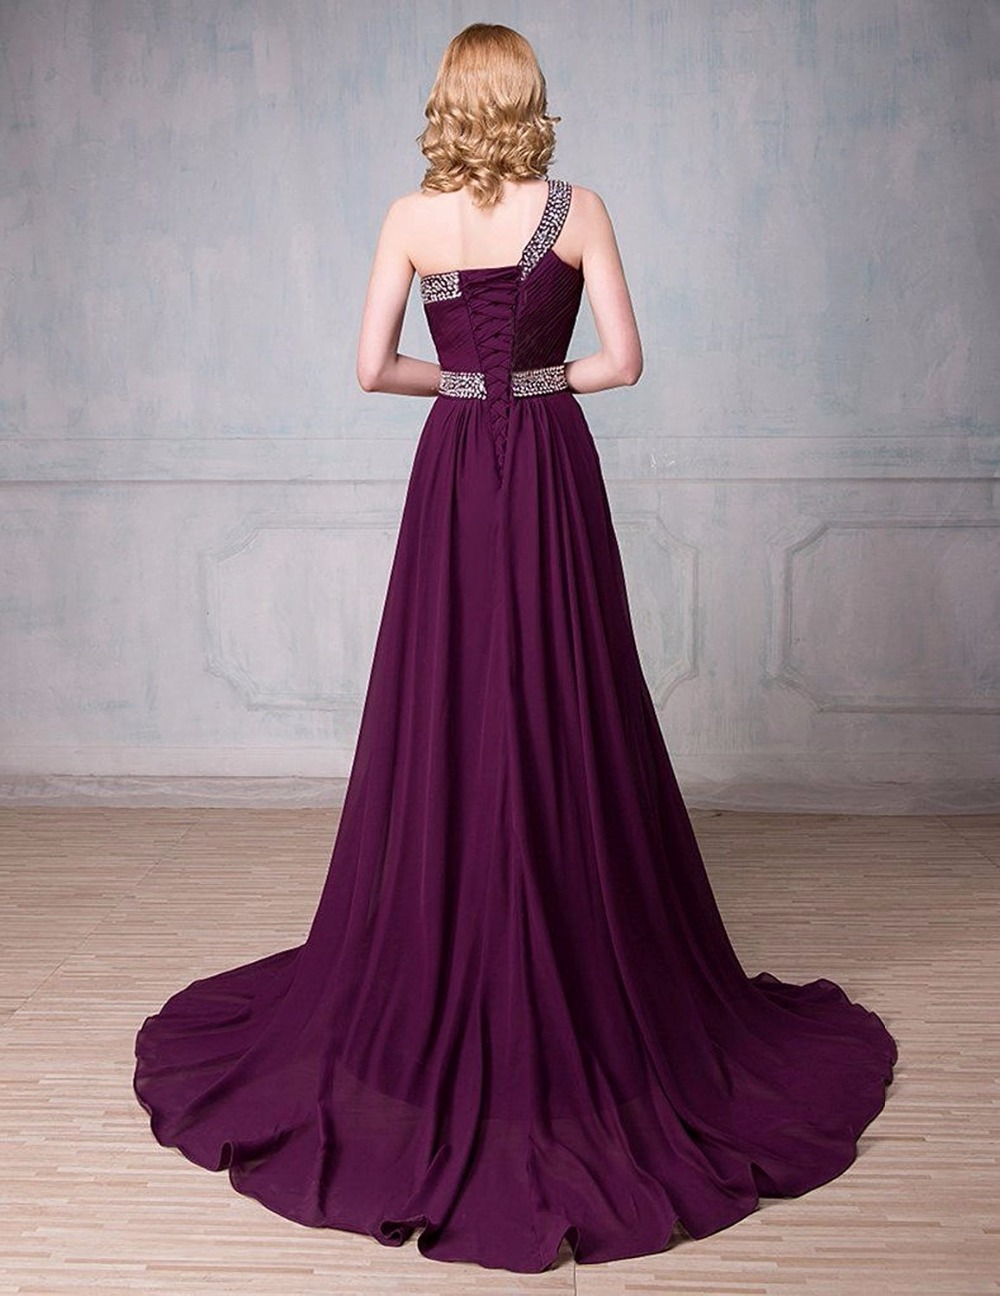 Bealegantom 2018 Gradient One Shoulder Chiffon Prom Evening Dresses ...